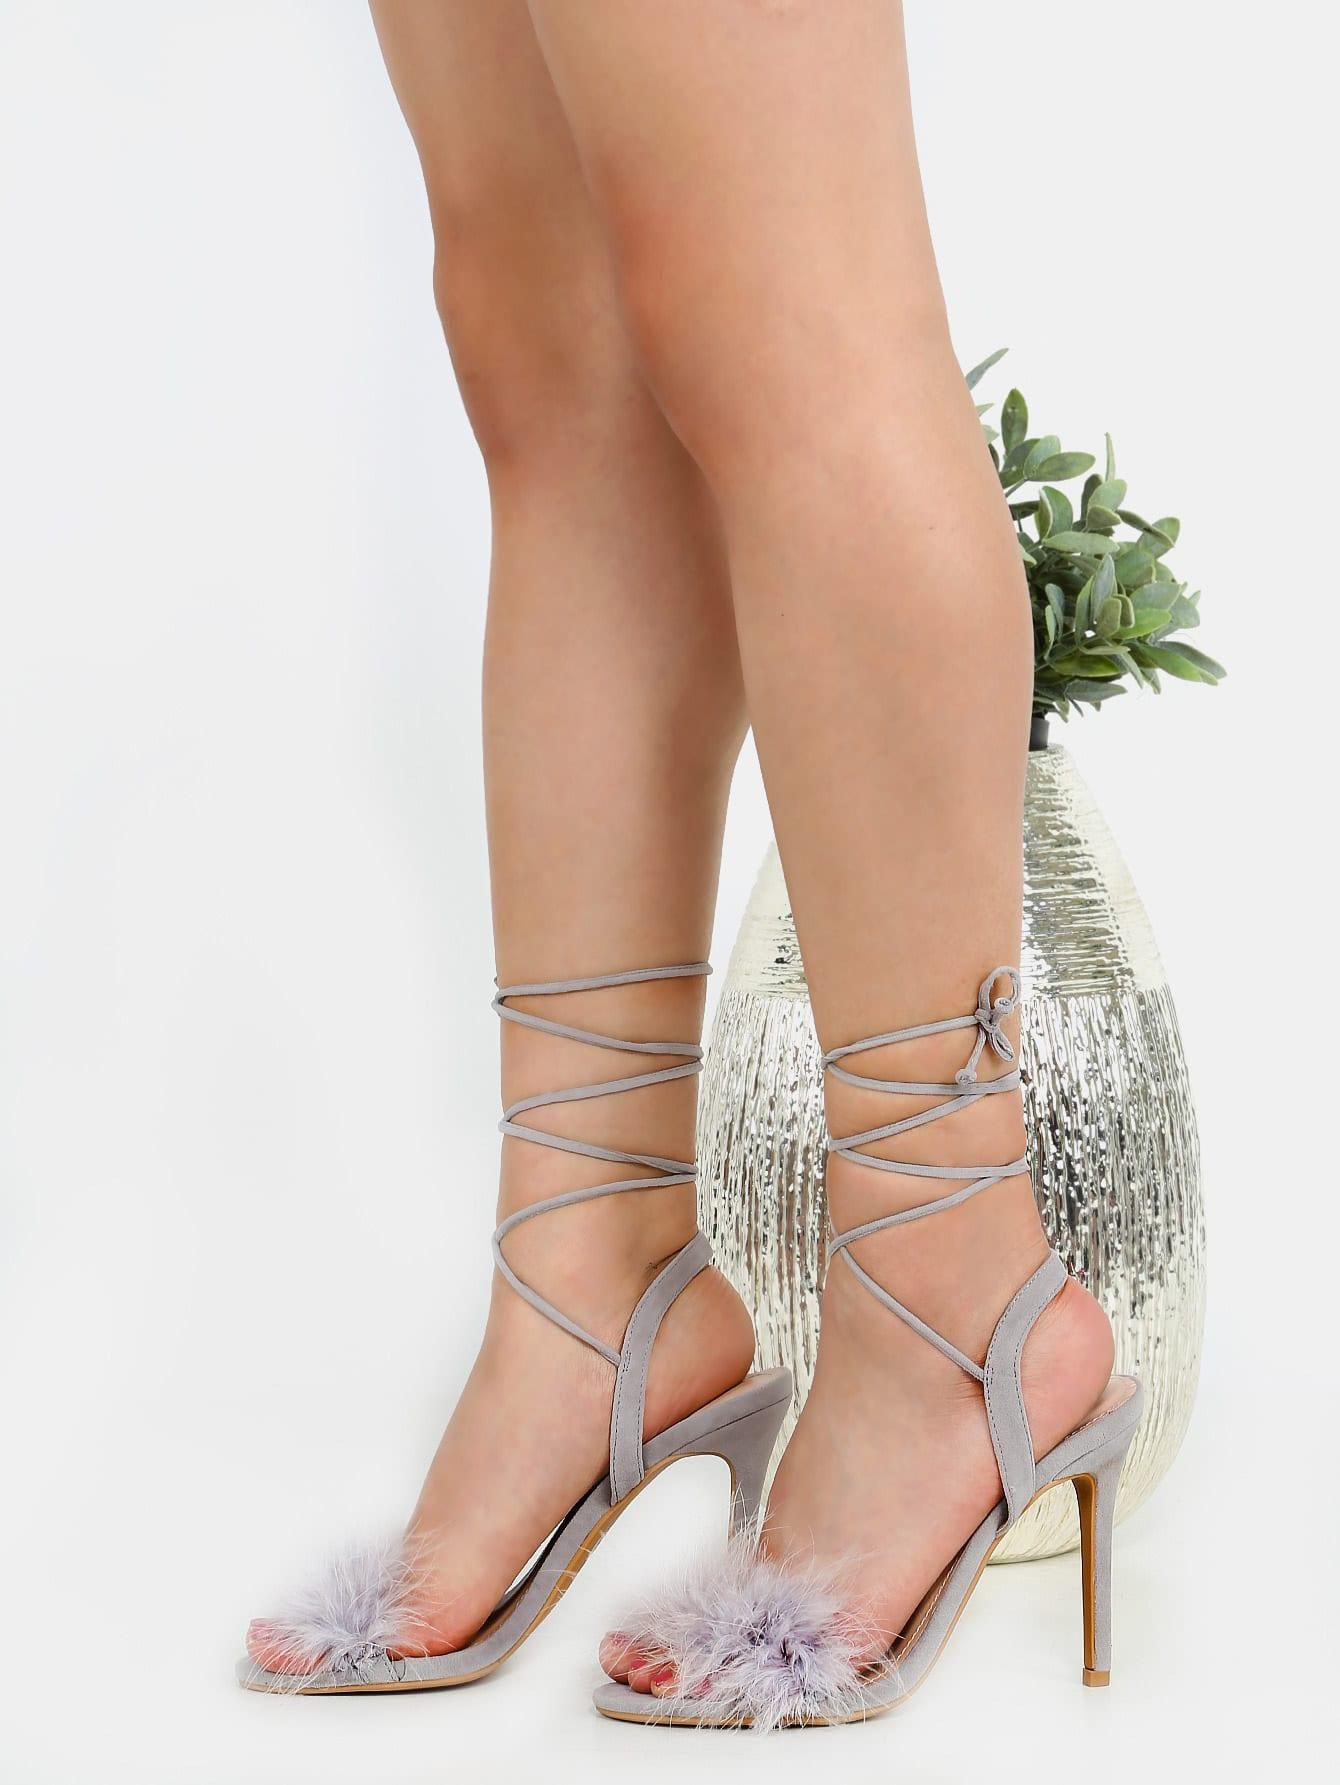 Open Toe Feather Wrap Heels GREY mmcheel-gatsby-grey